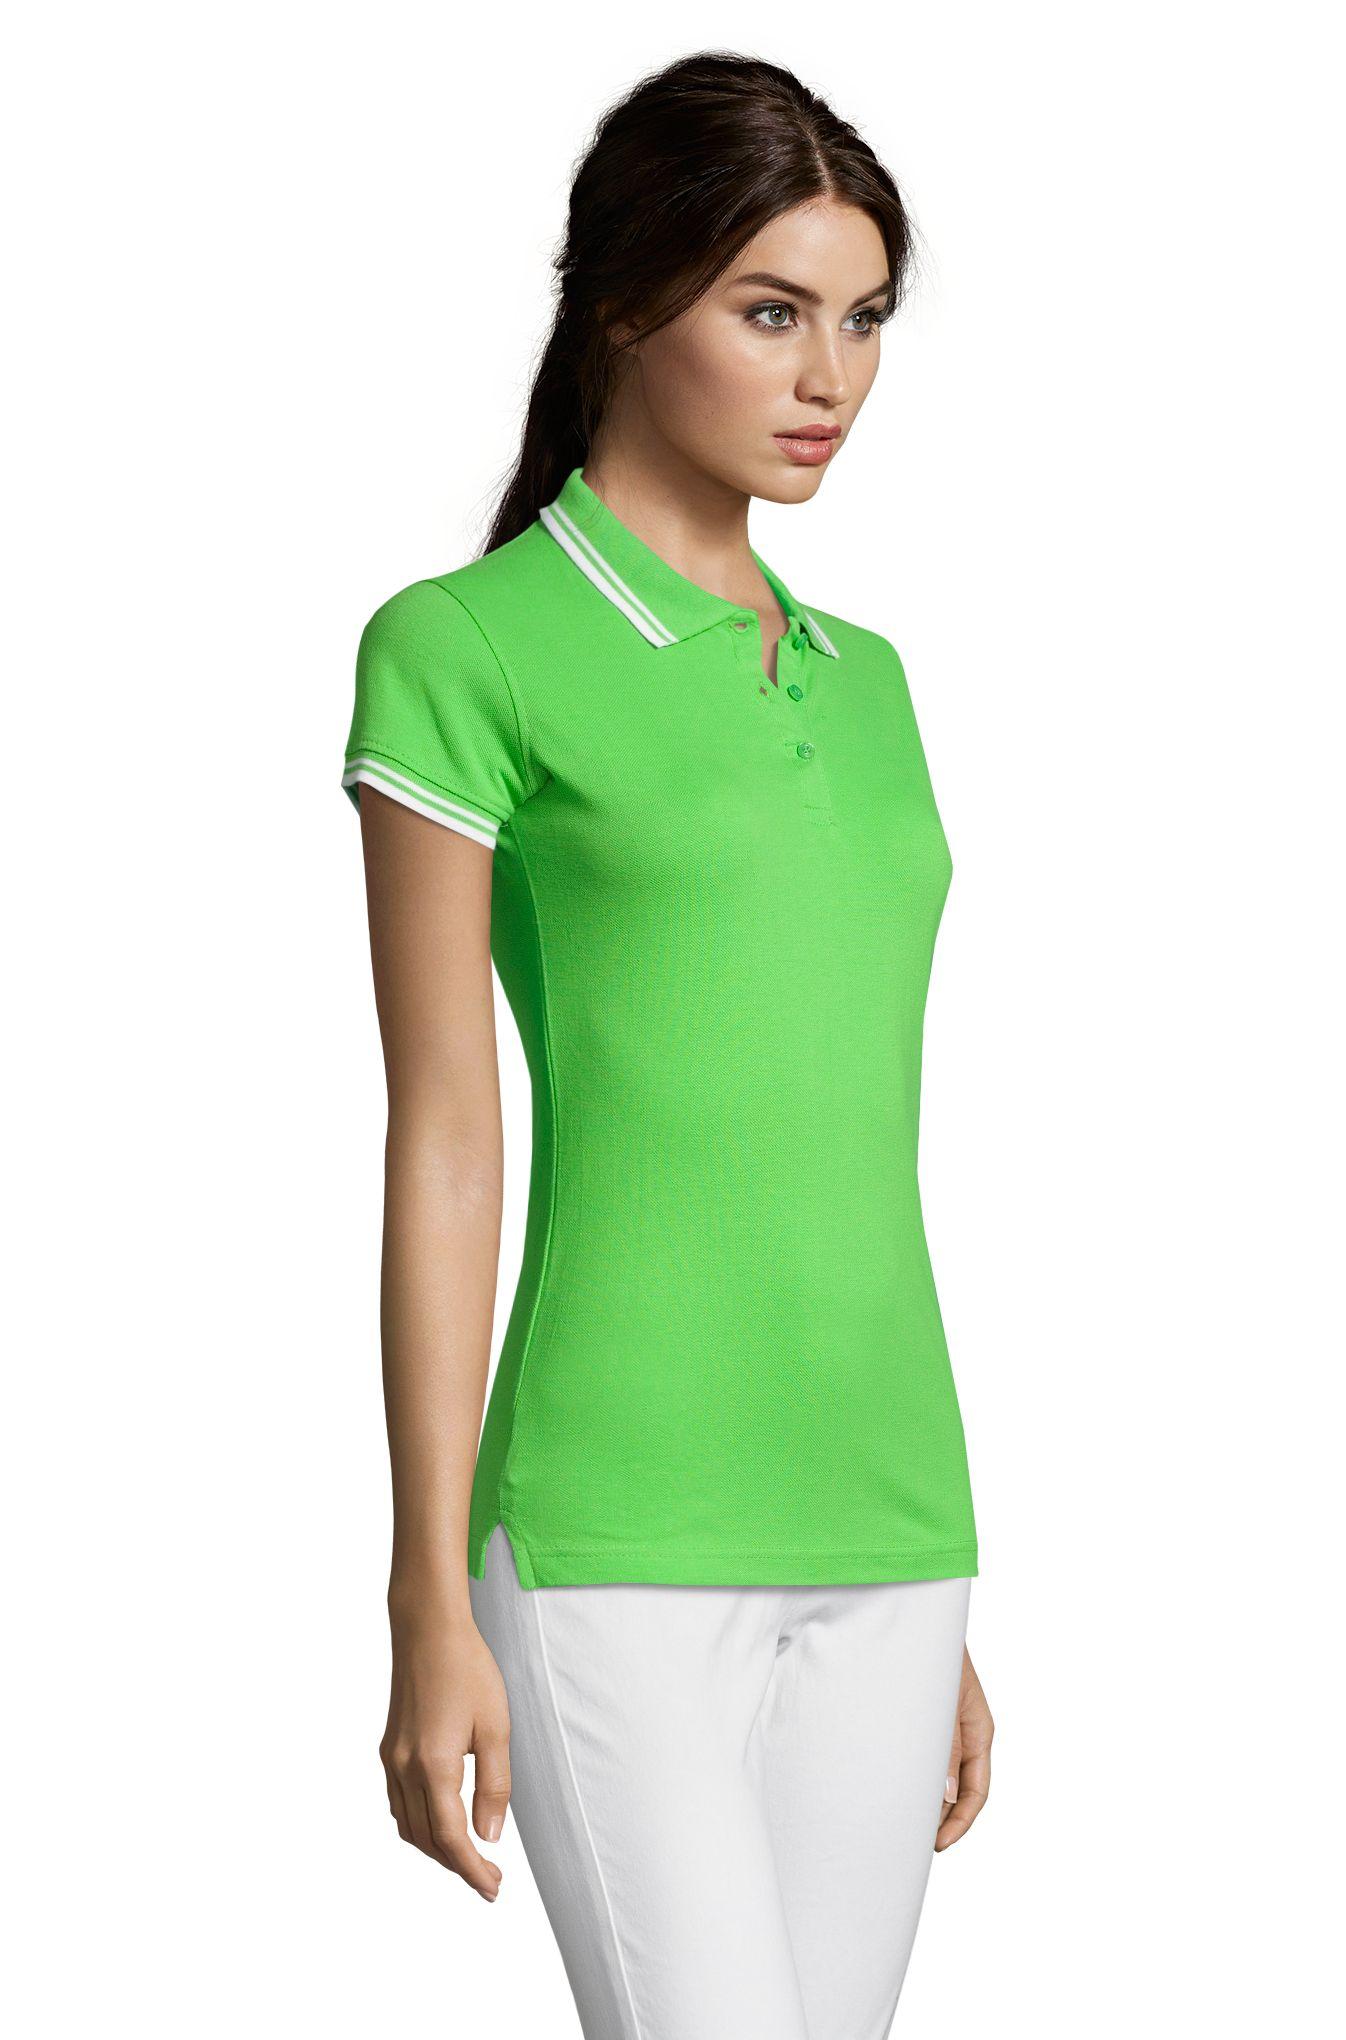 794 - Lime / Blanc